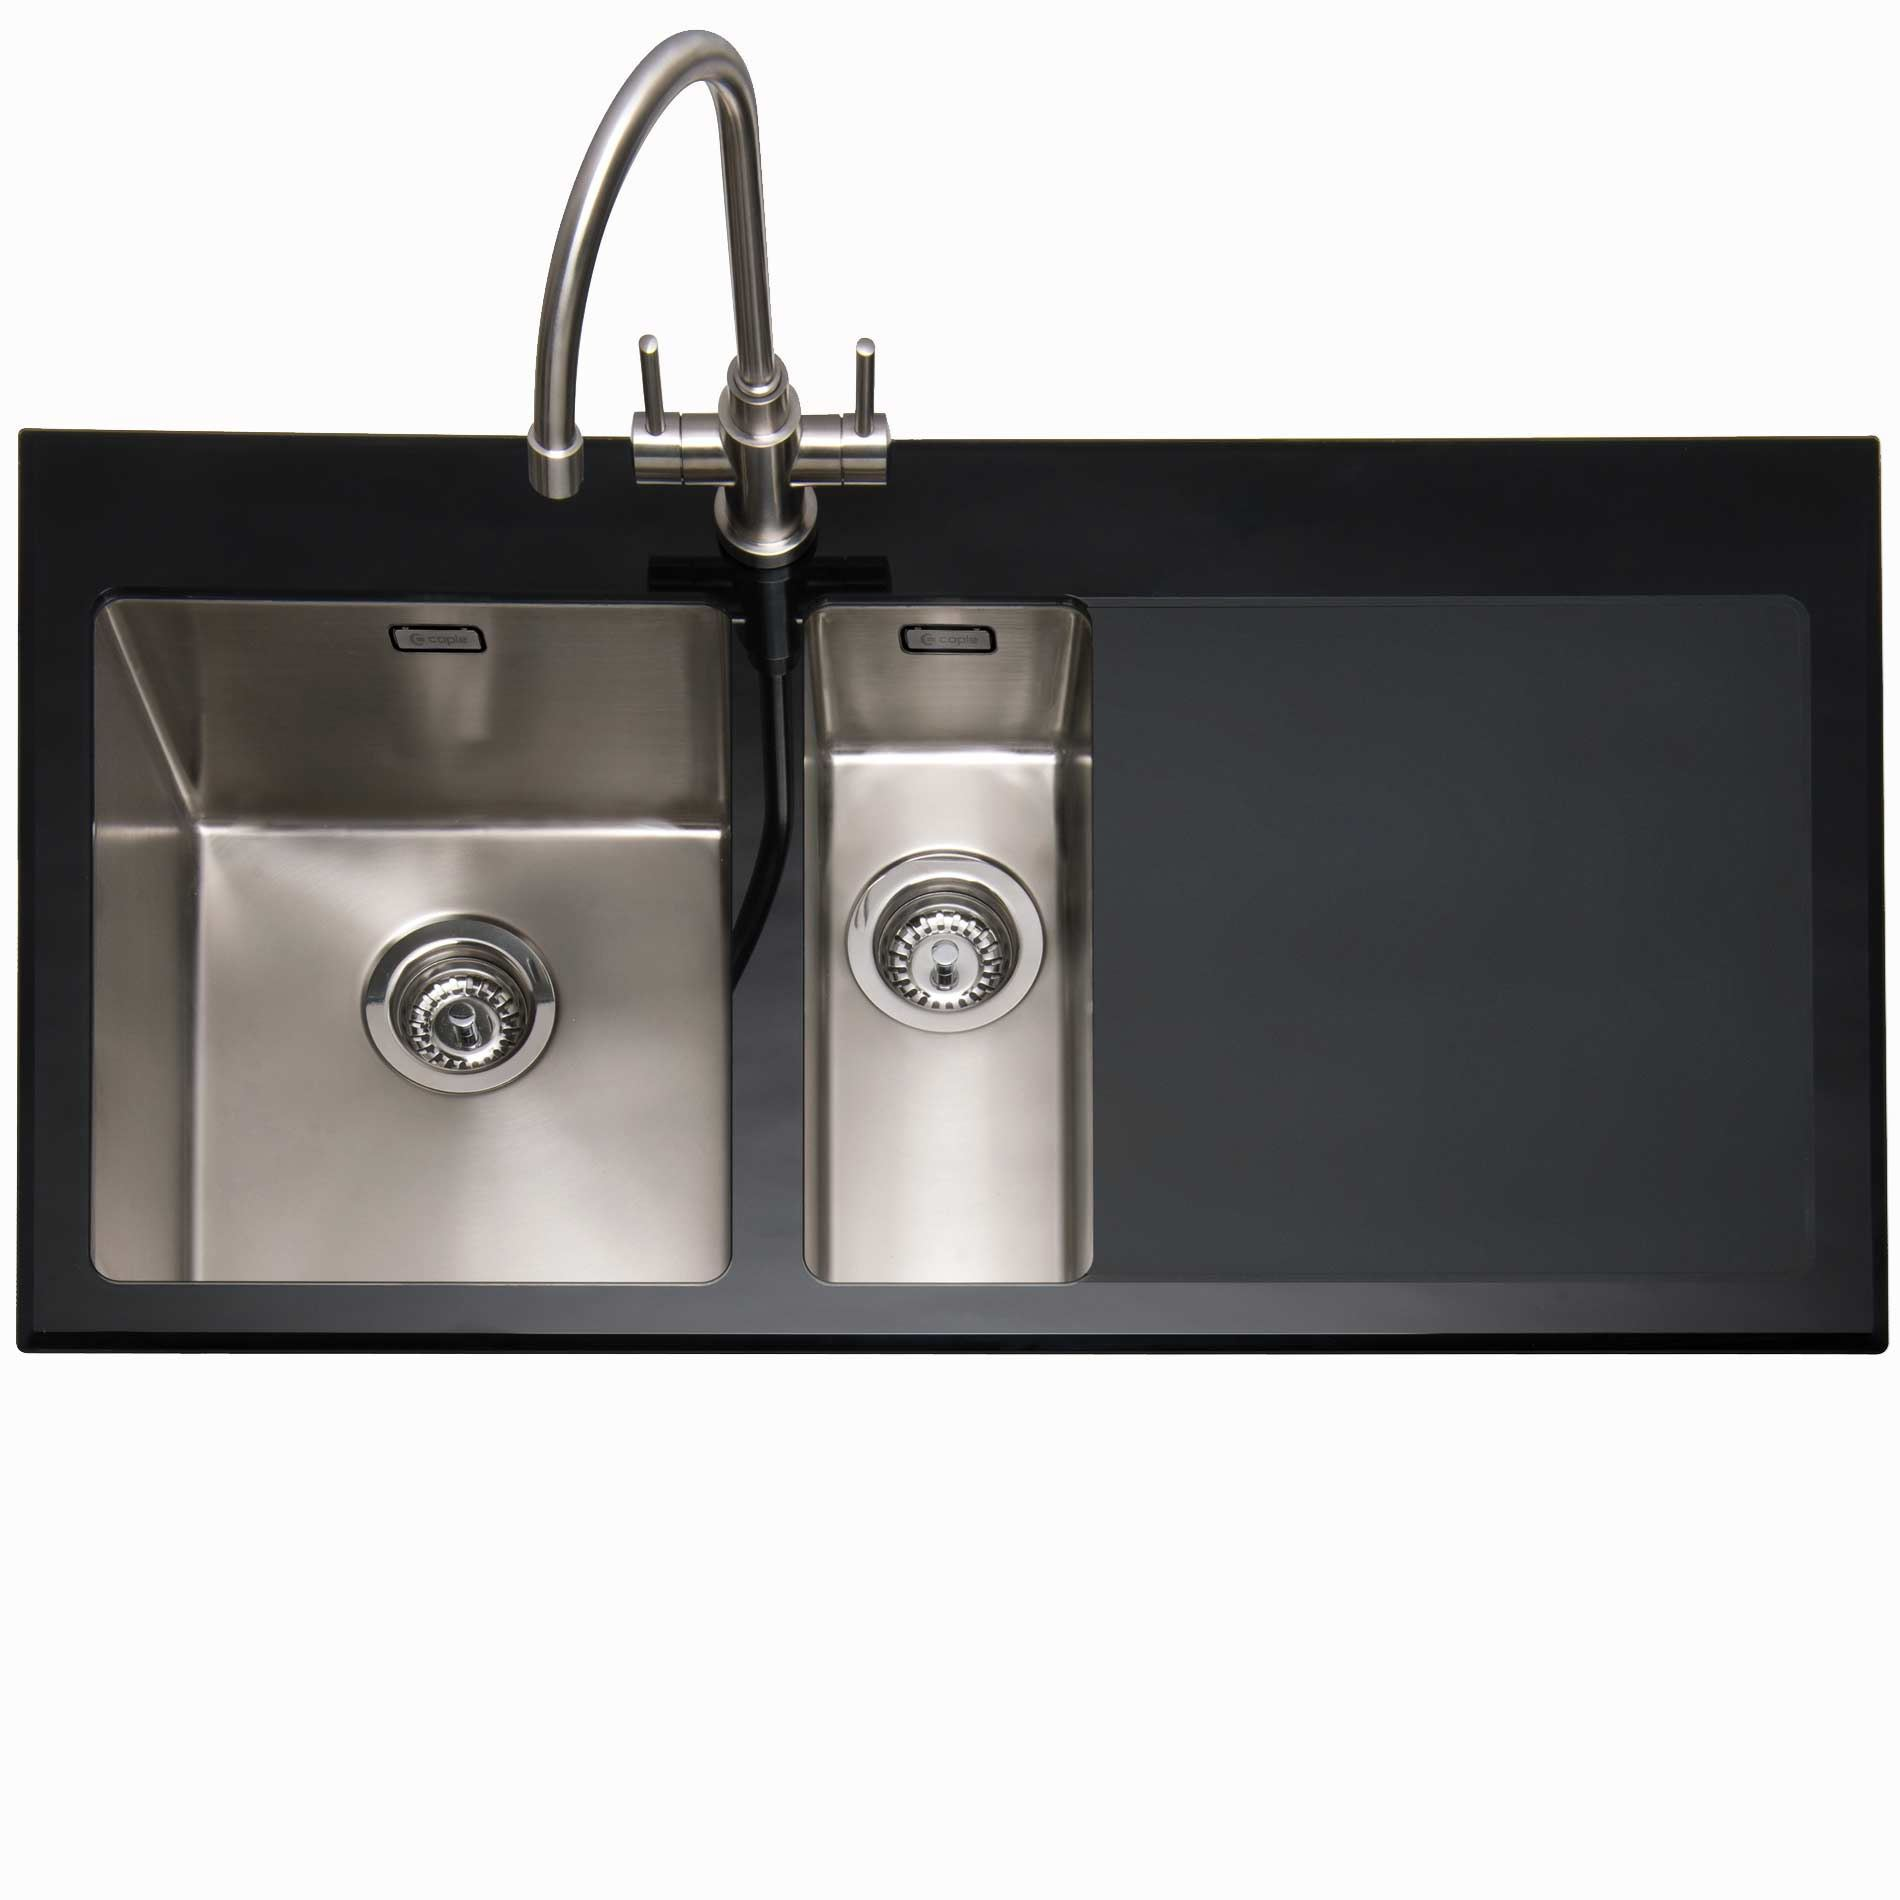 black stainless sink stainless steel apron sink. Black Bedroom Furniture Sets. Home Design Ideas